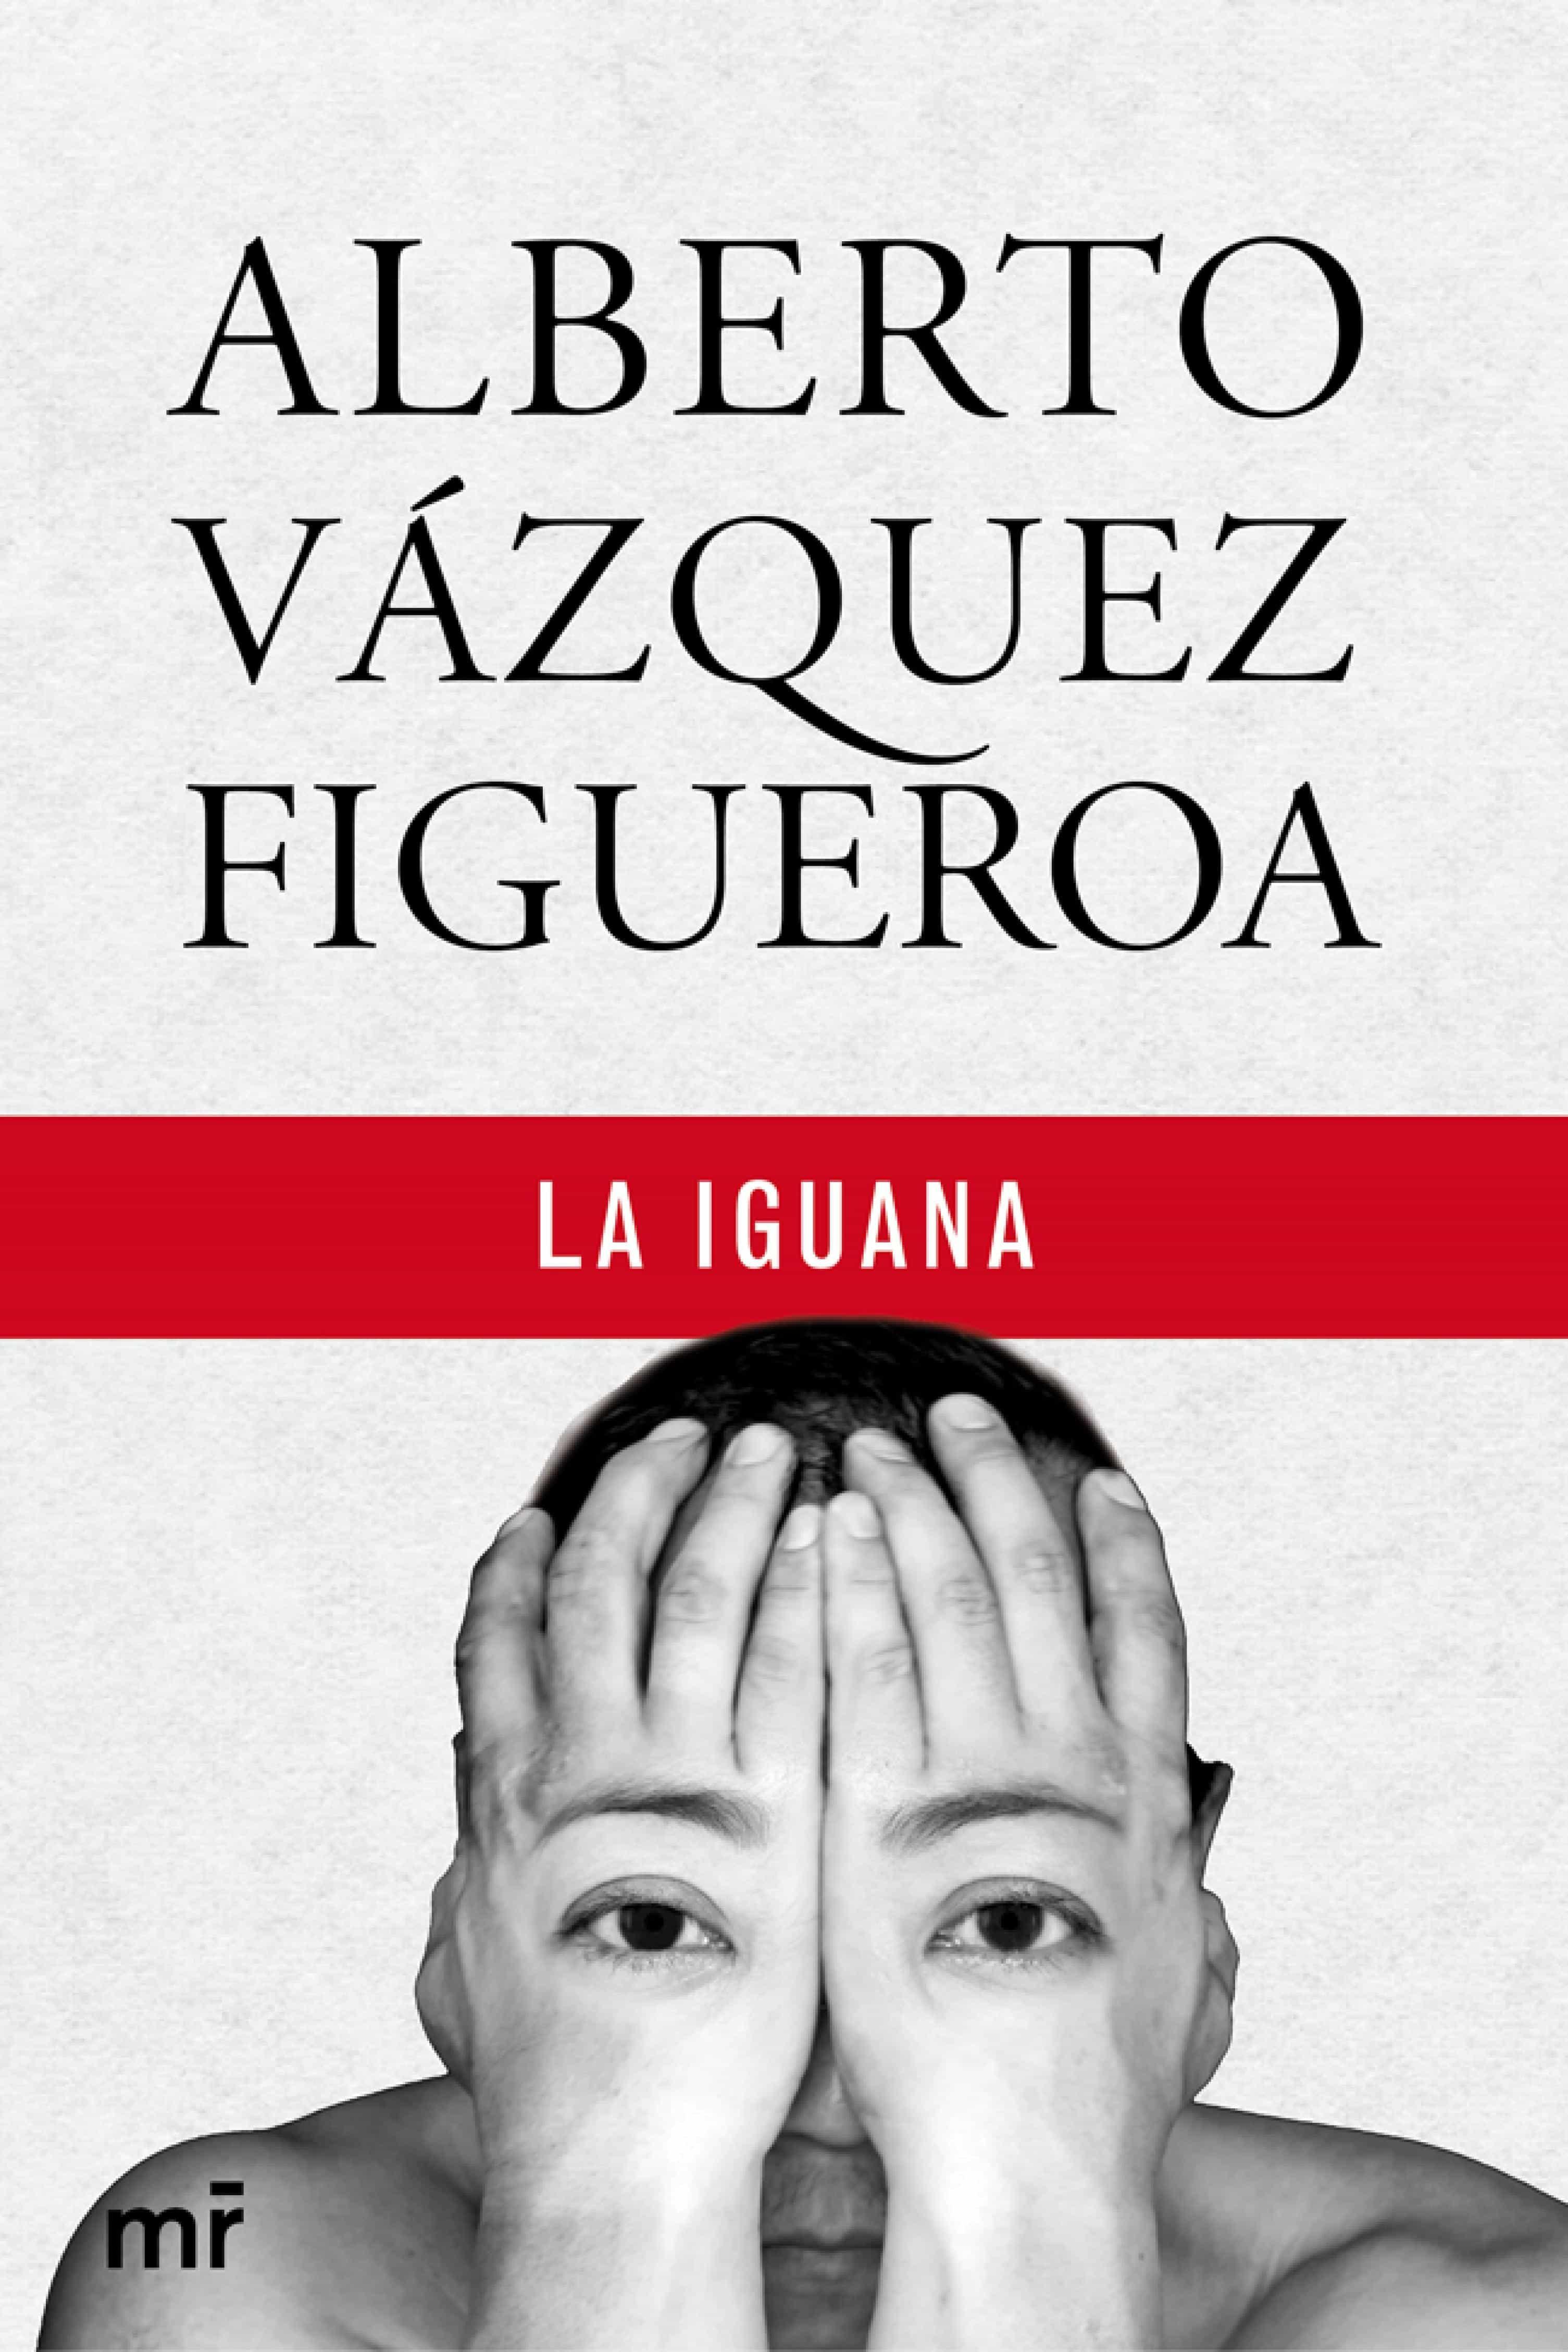 LA IGUANA VAZQUEZ FIGUEROA EPUB